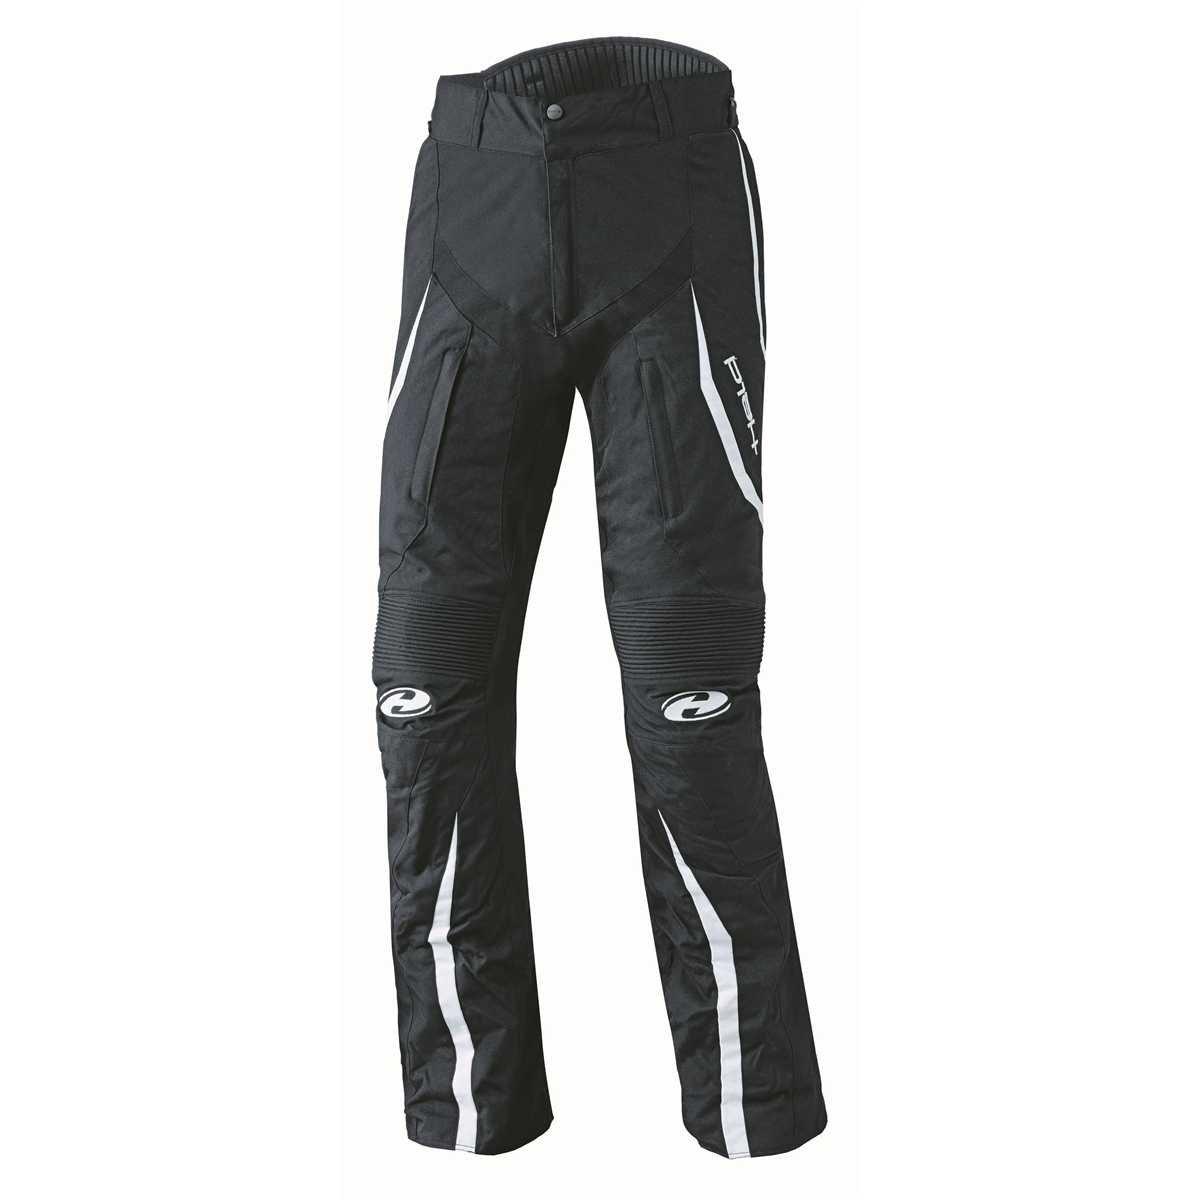 Farbe schwarz-weiss Gr/ö/ße D-M Held Link sportliche Damen Motorradhose